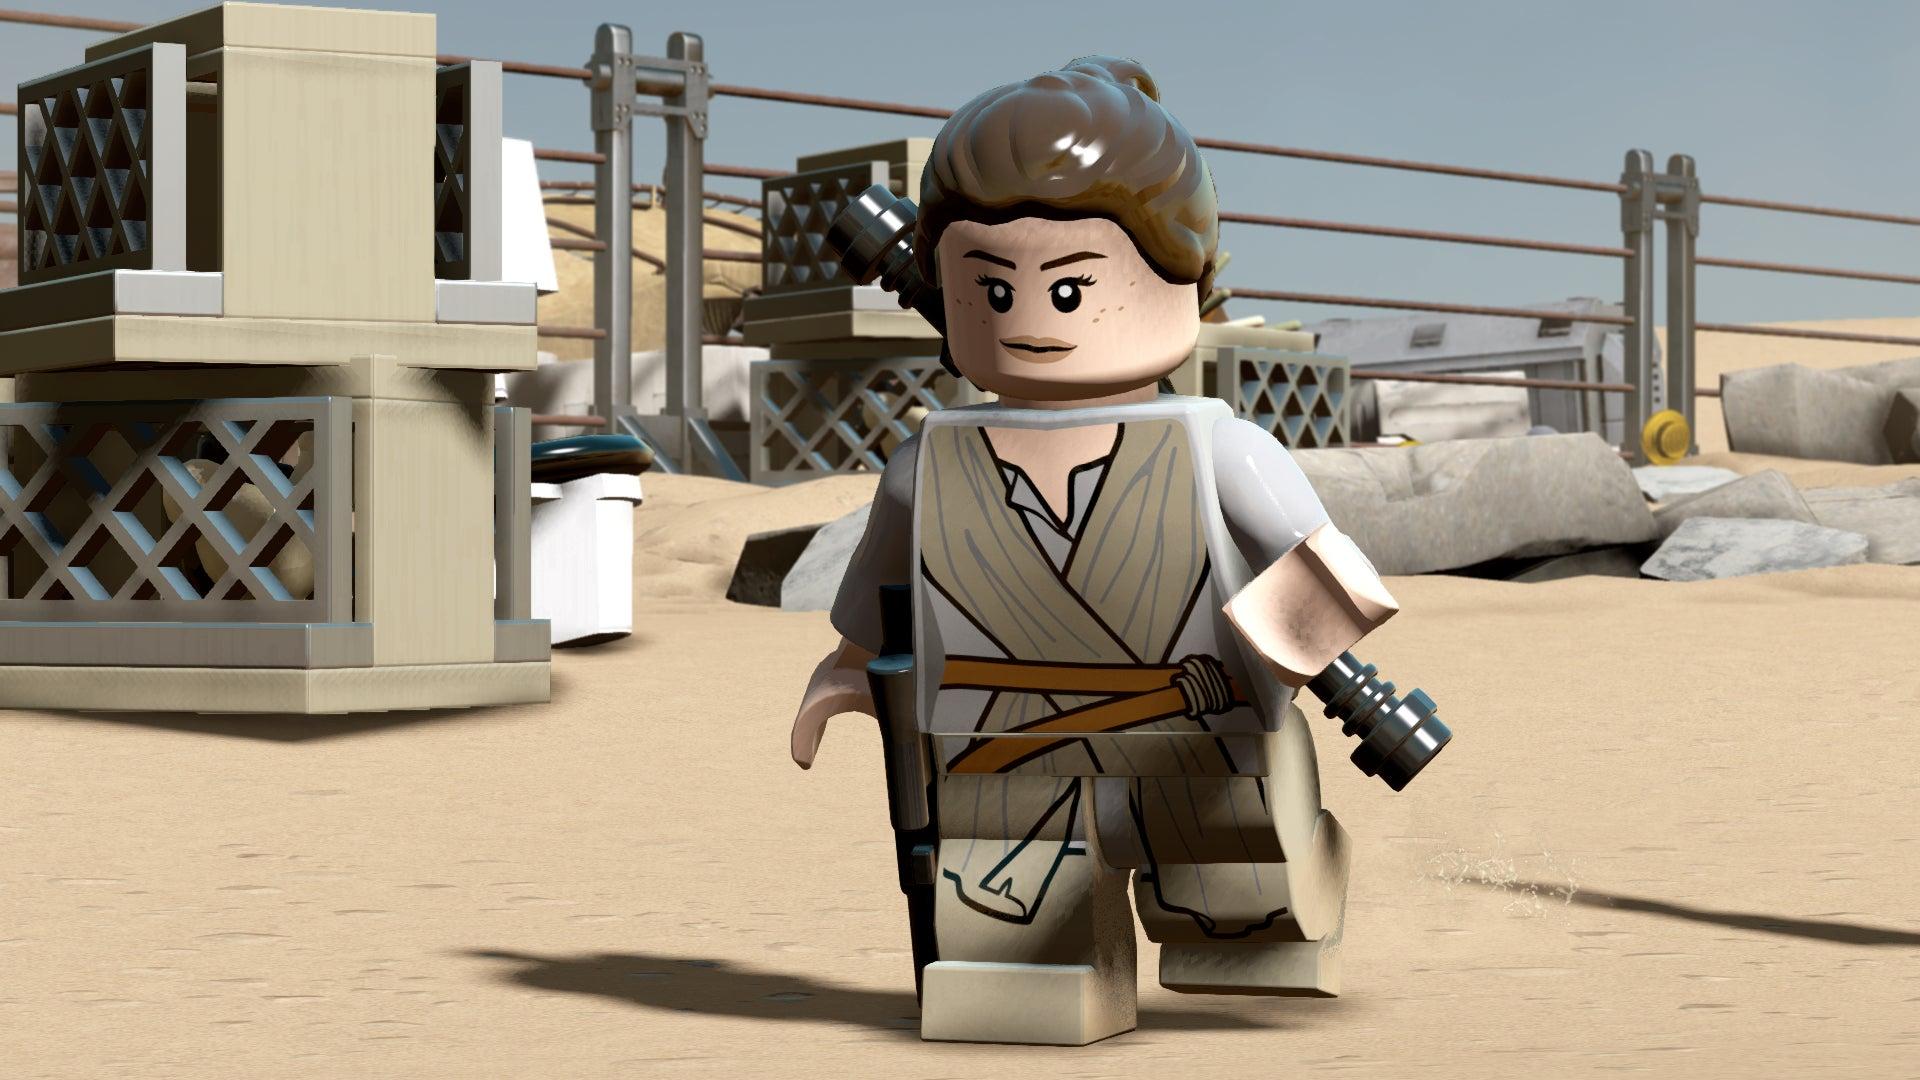 Image for LEGO Star Wars: The Force Awakens blaster battles revealed in debut gameplay